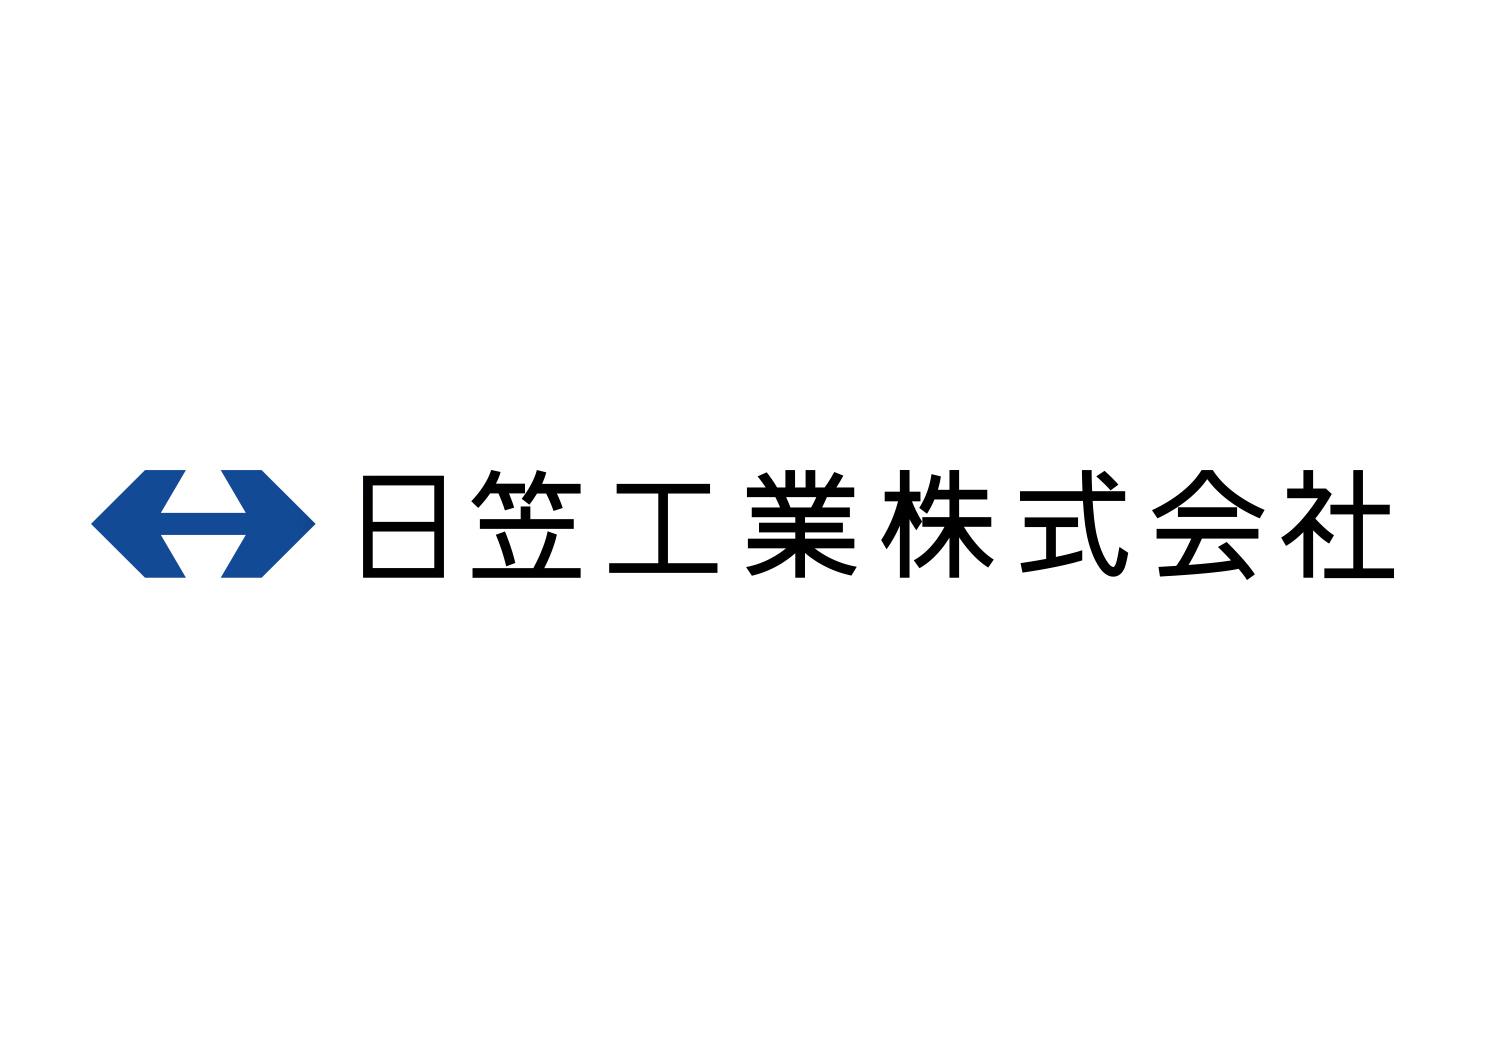 HIGASA logo